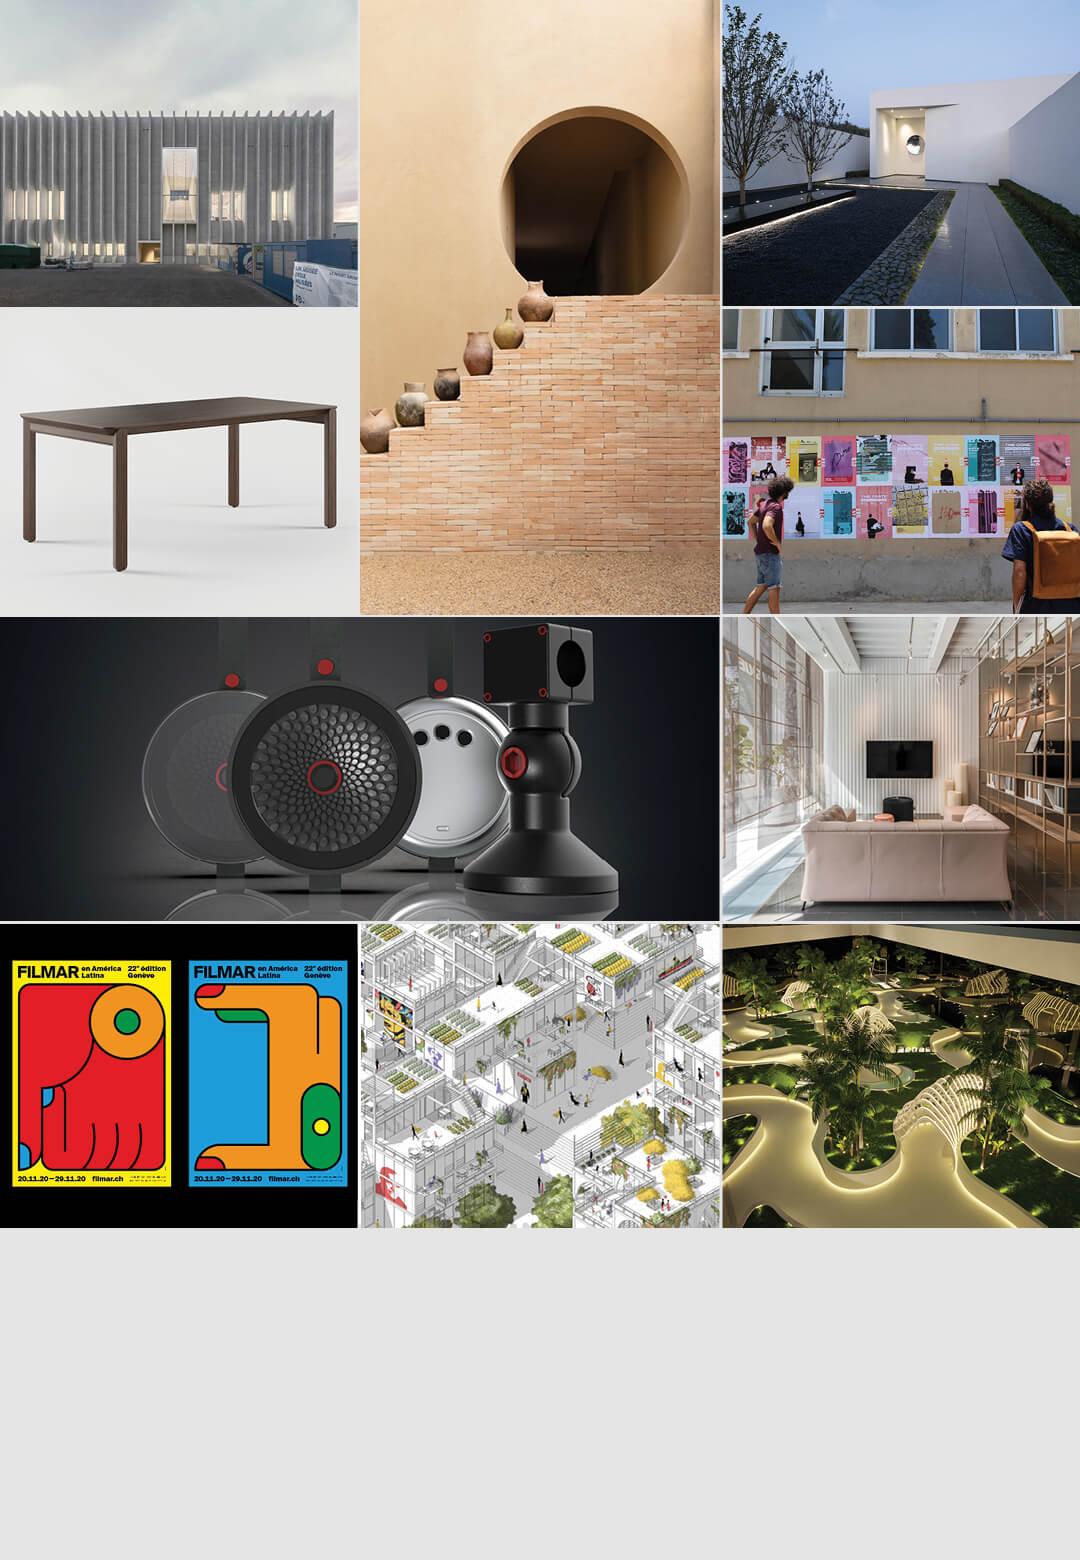 DNA Paris has revealed its list of 2021 design awards winners | DNAParis Design Awards 2021 Winners | STIRworld